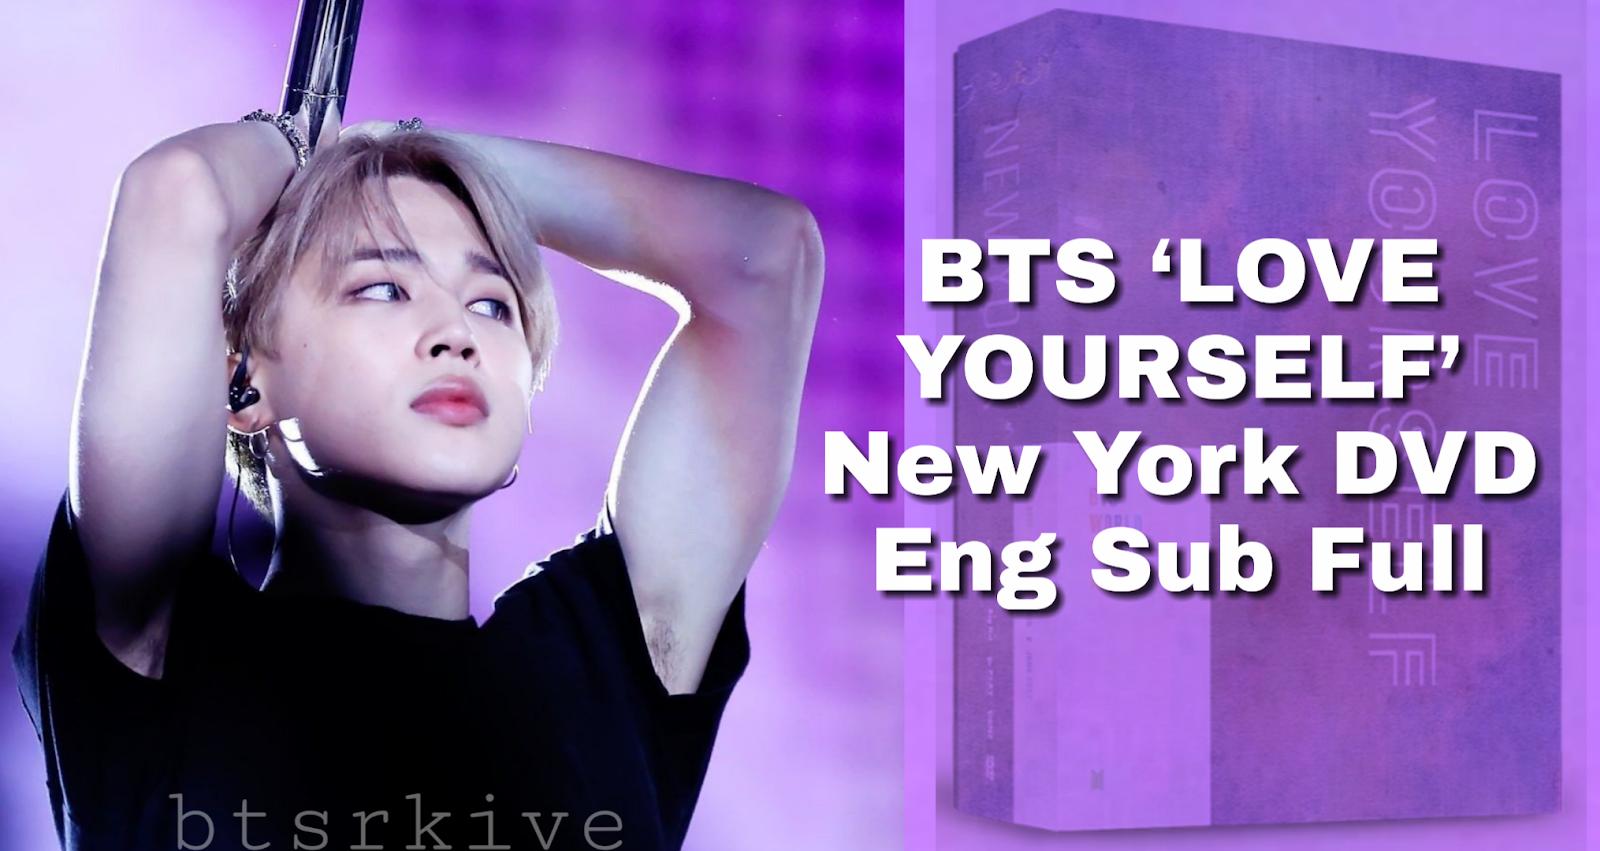 BTS WORLD TOUR 'LOVE YOURSELF' New York DVD Eng Sub Full